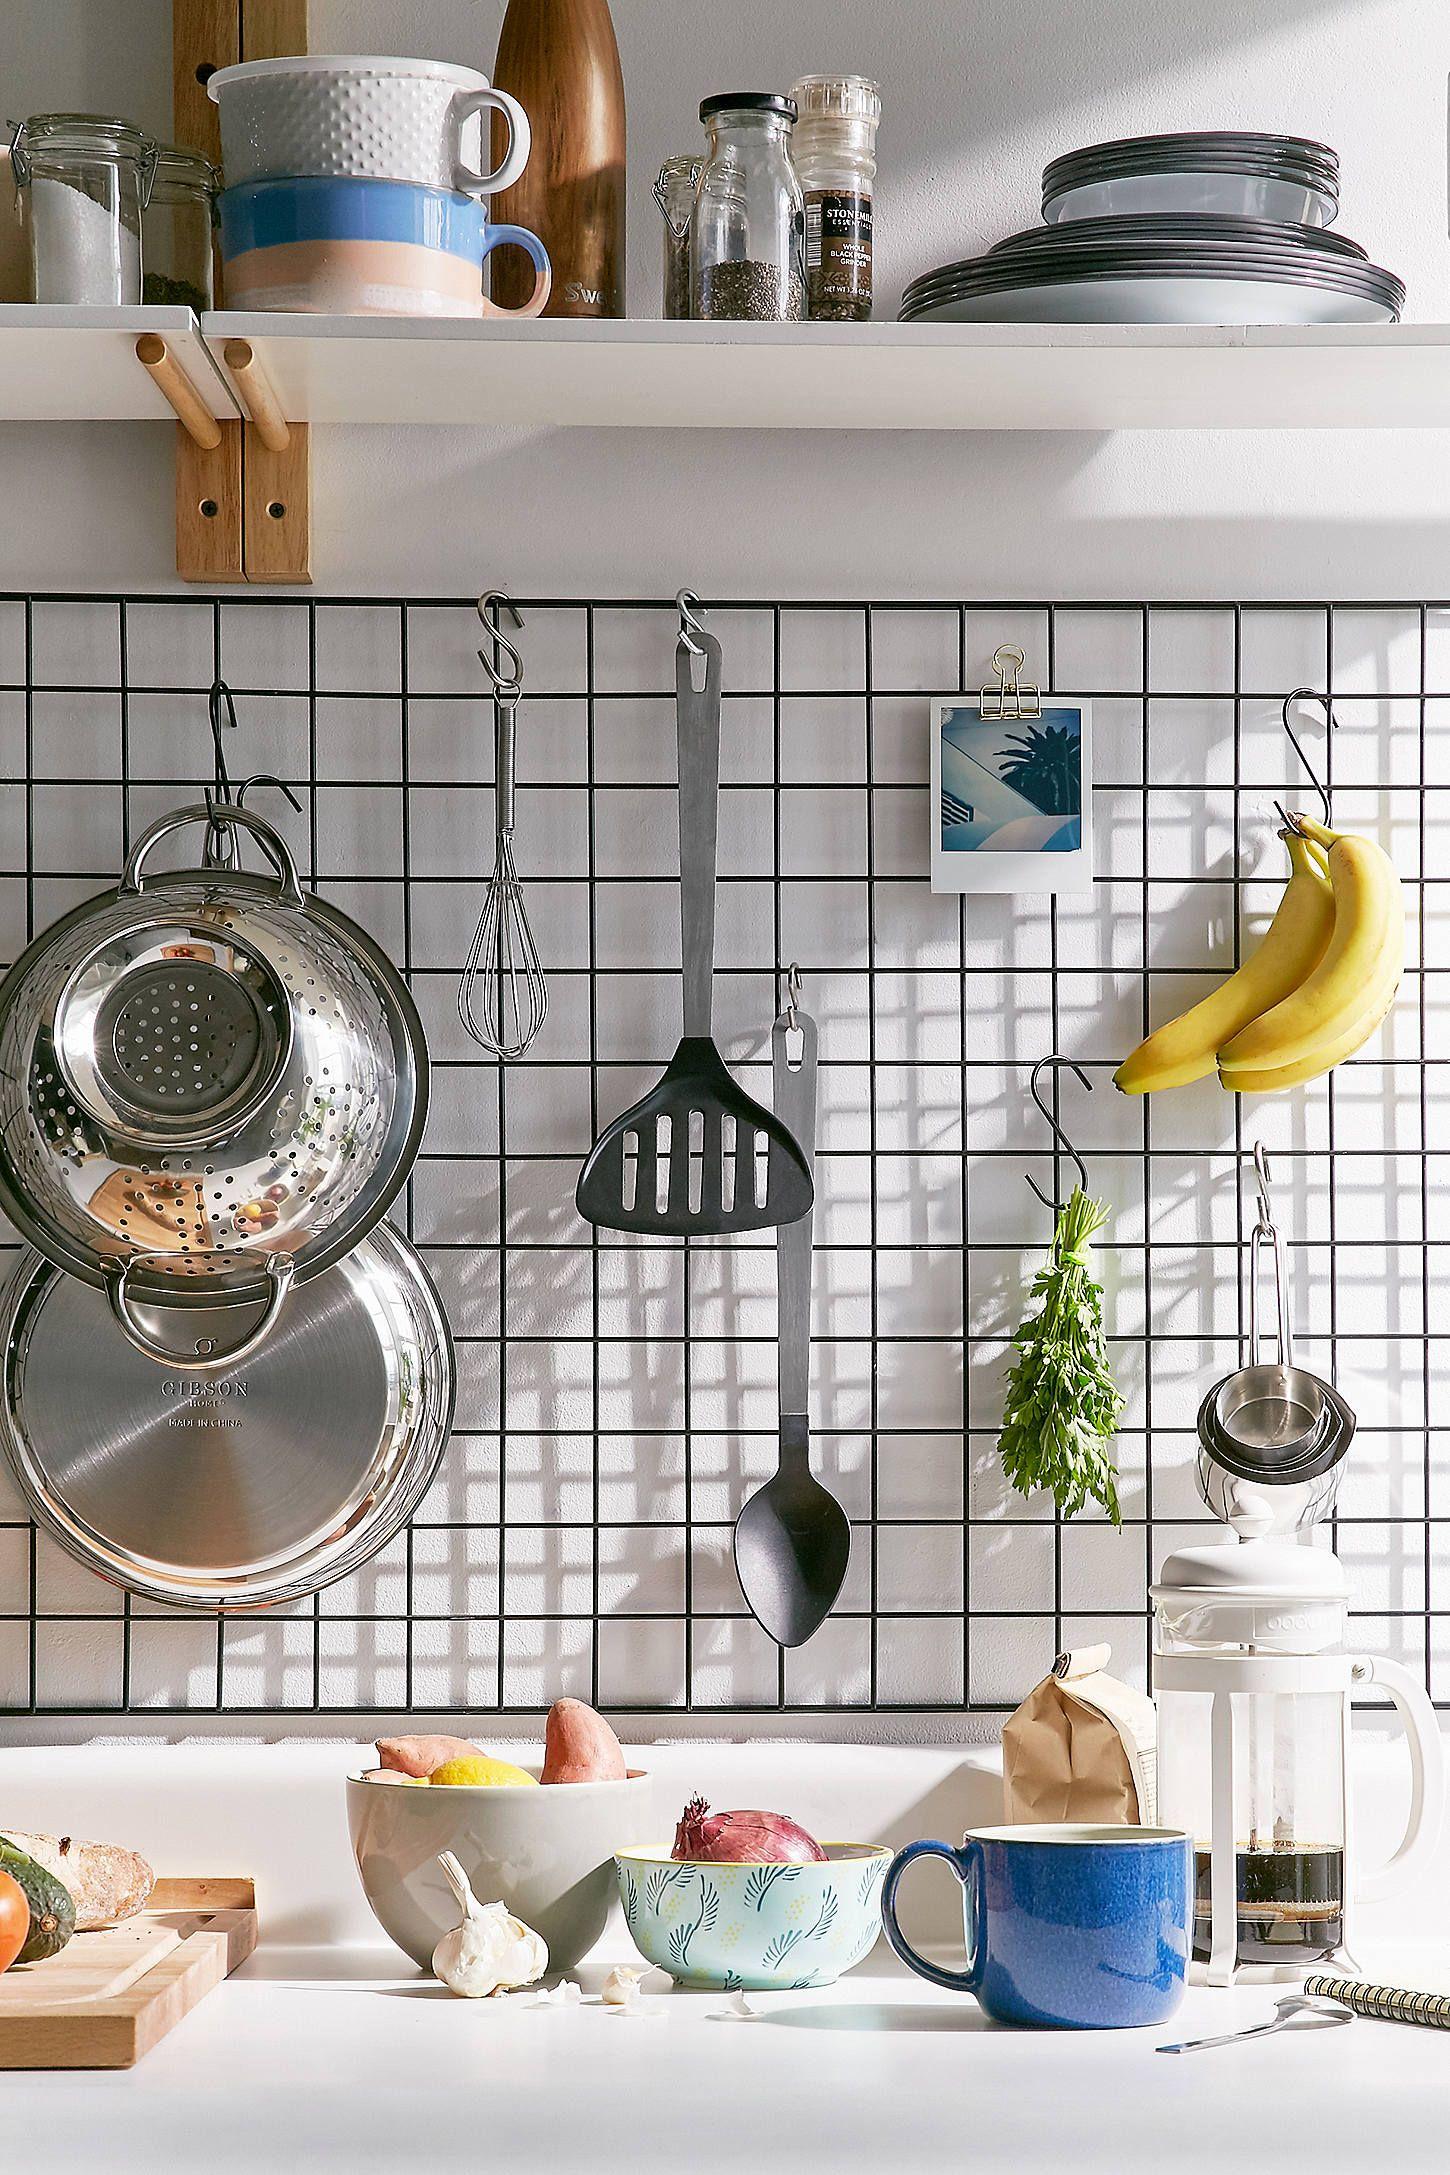 wire wall grid shelf kitchen wall storage kitchen utensil storage home decor kitchen on kitchen decor wall ideas id=50736